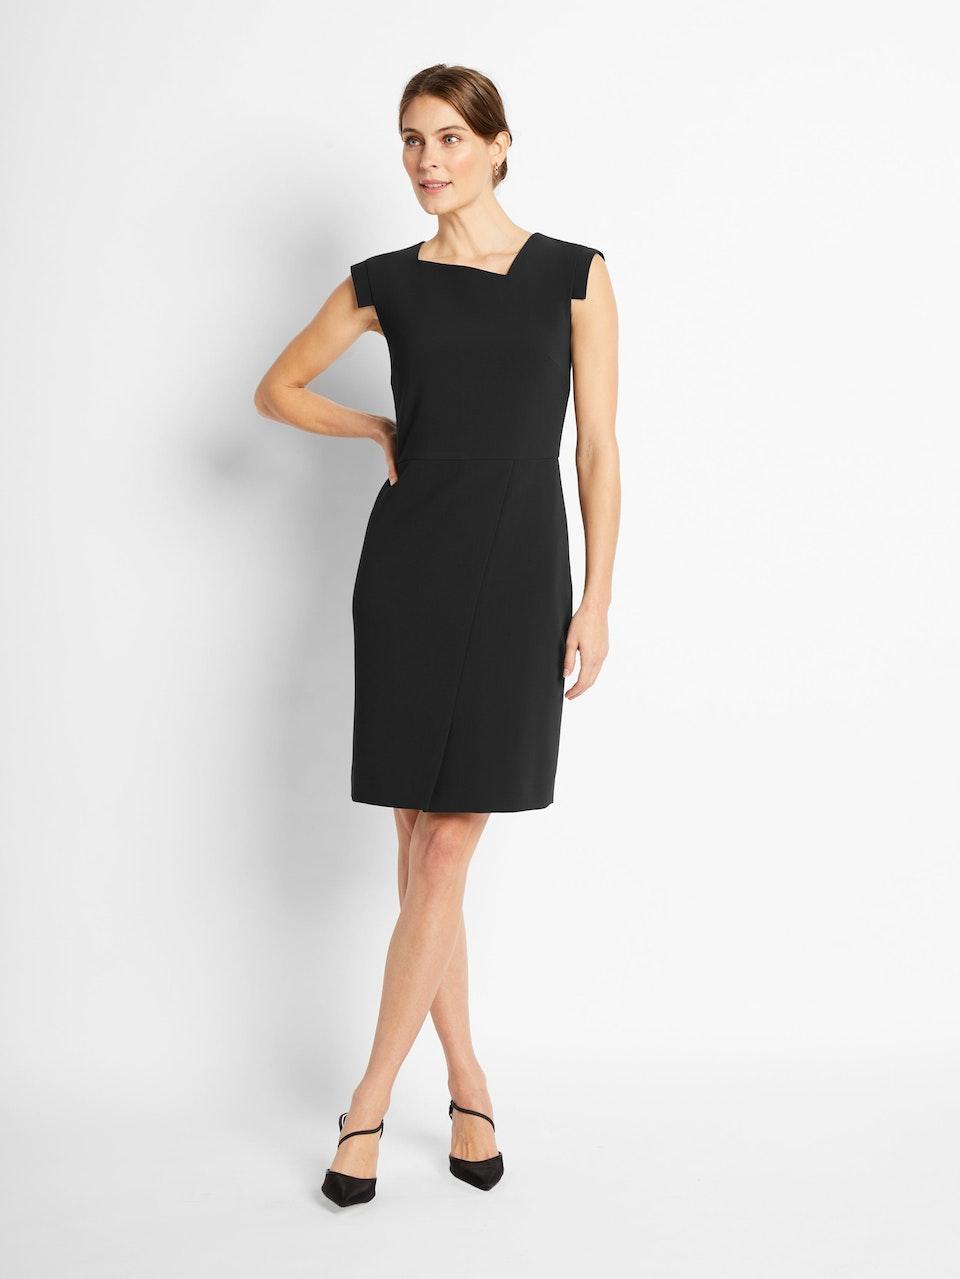 Carlisle Dress